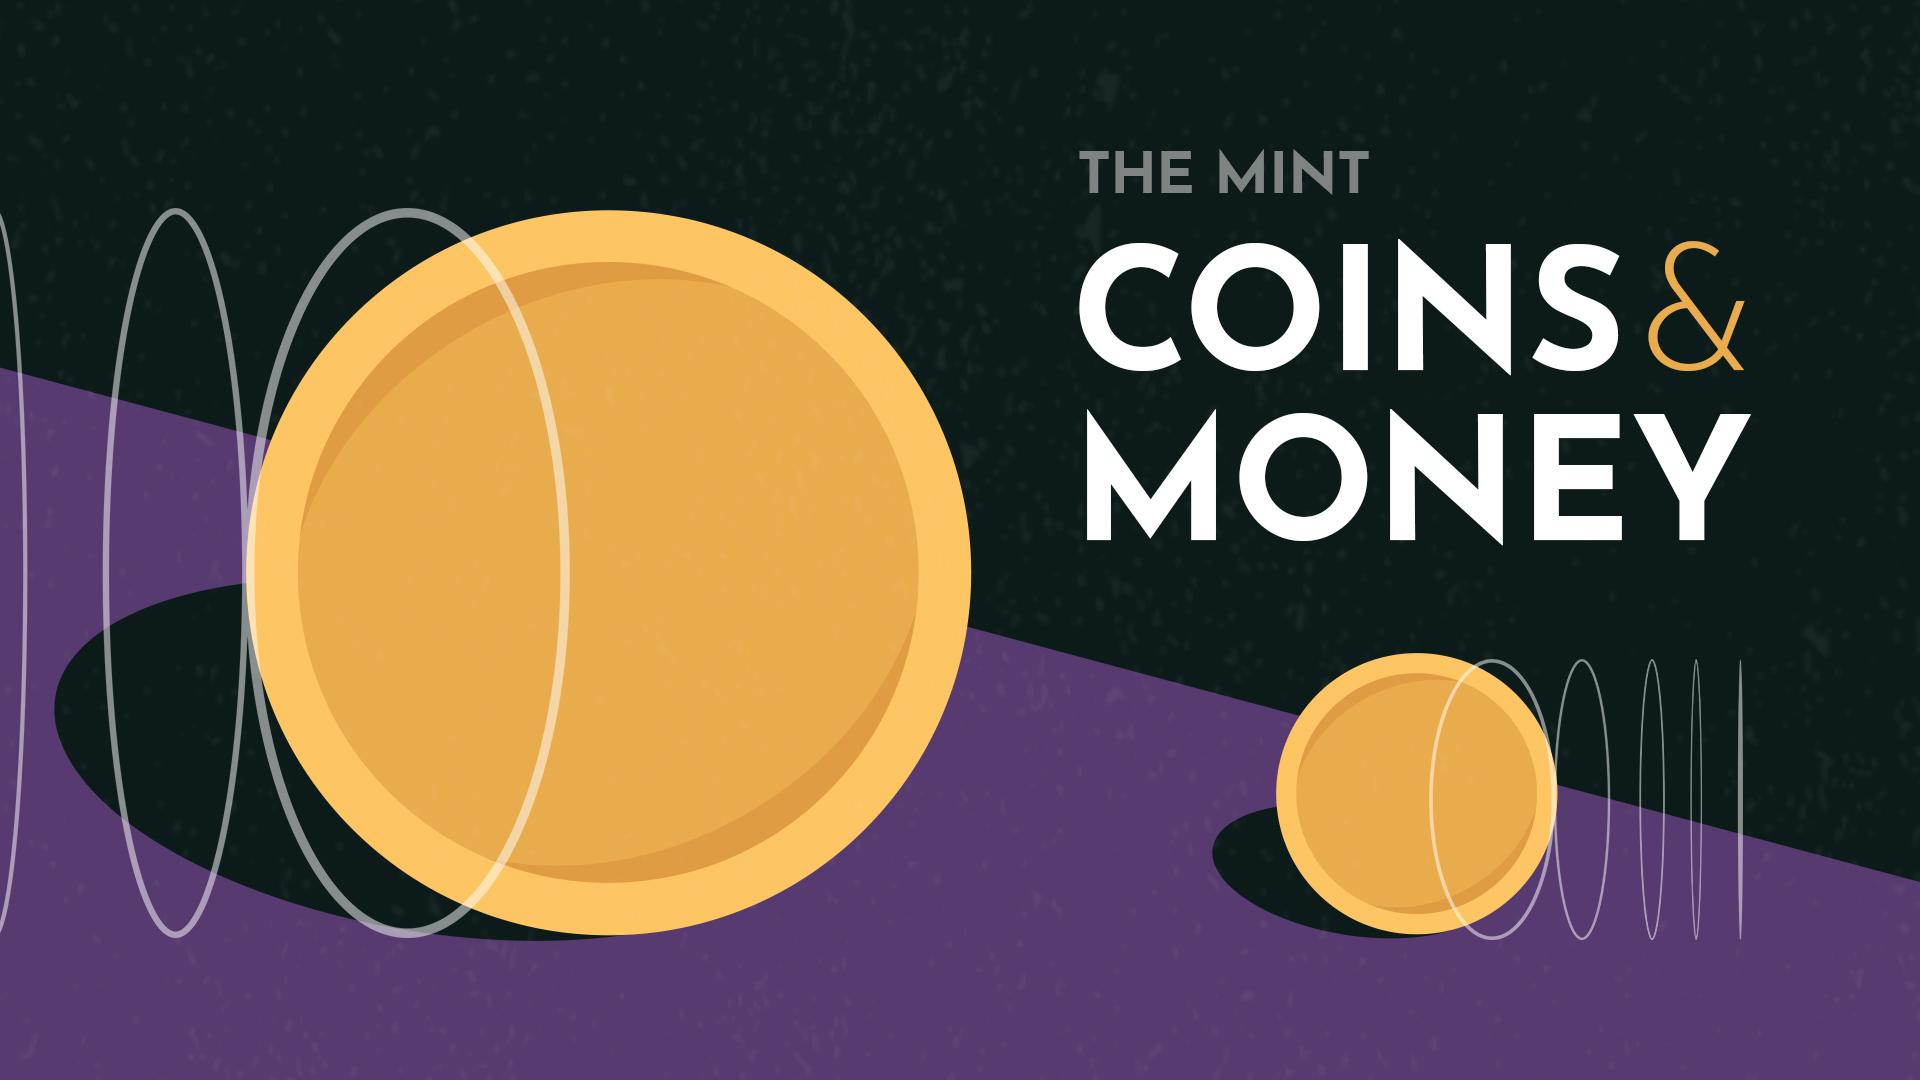 The Mint – Coins & Money